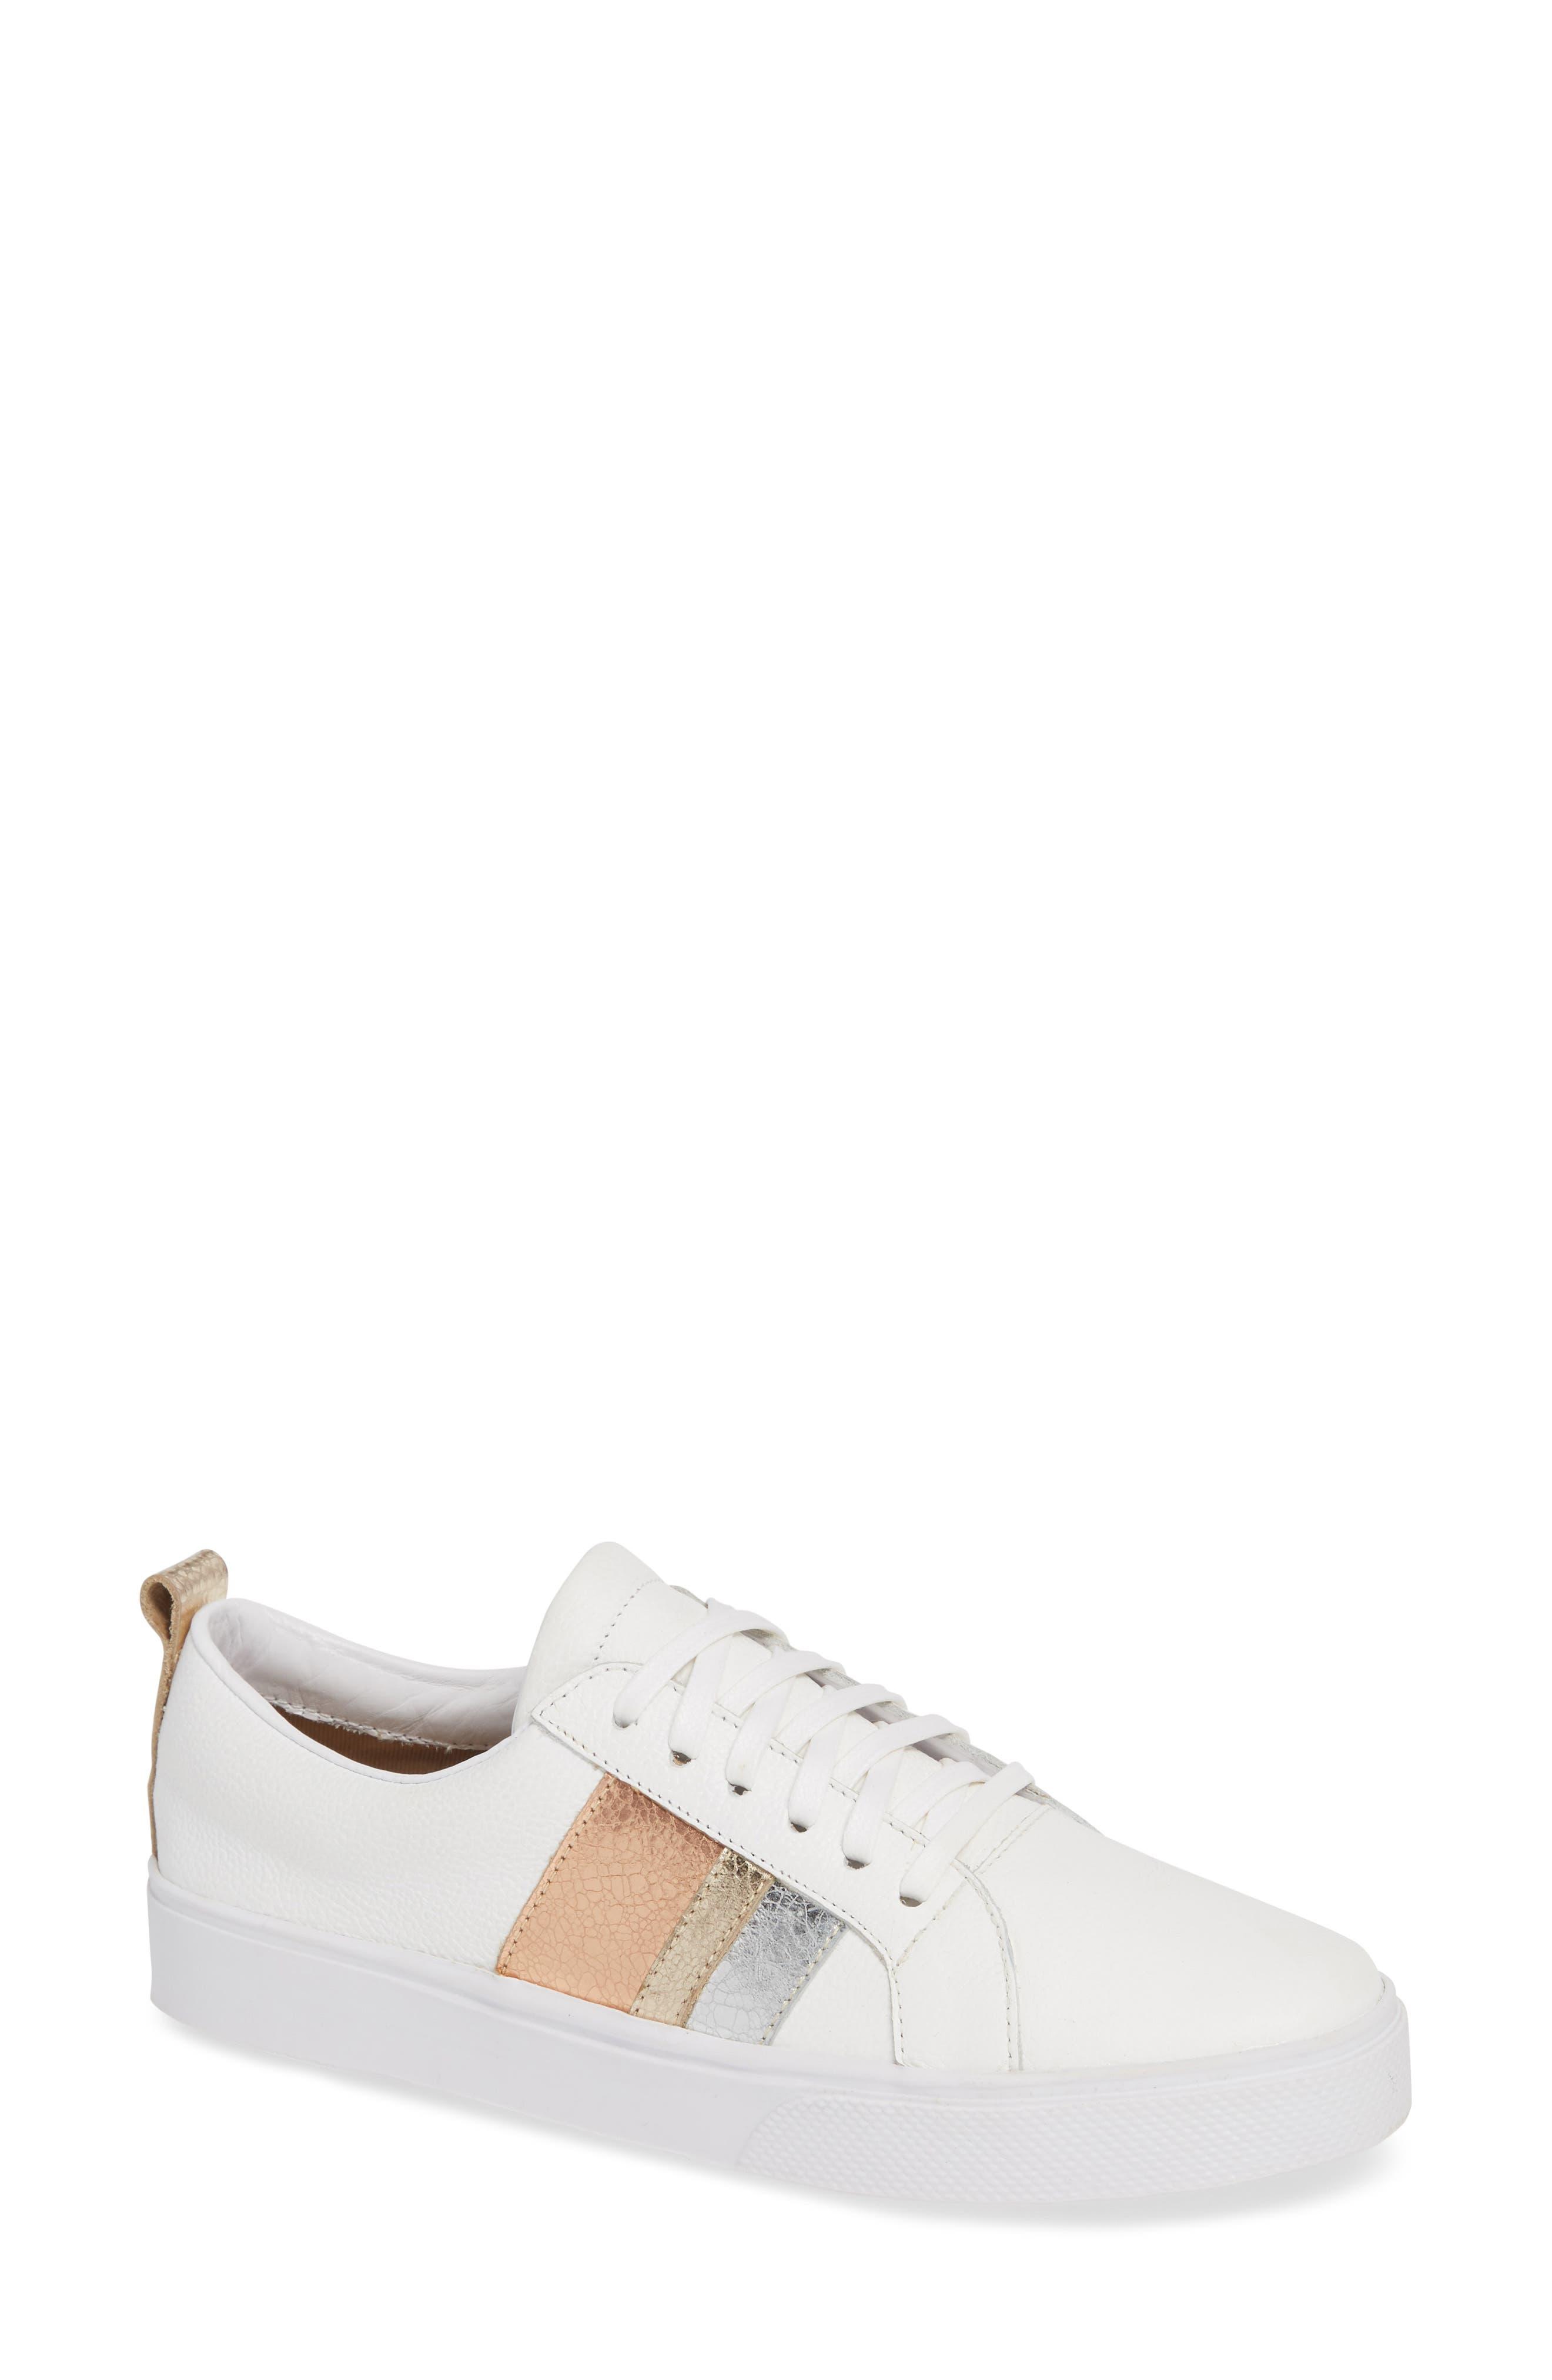 KAANAS Bristol Sneaker in Gold Leather